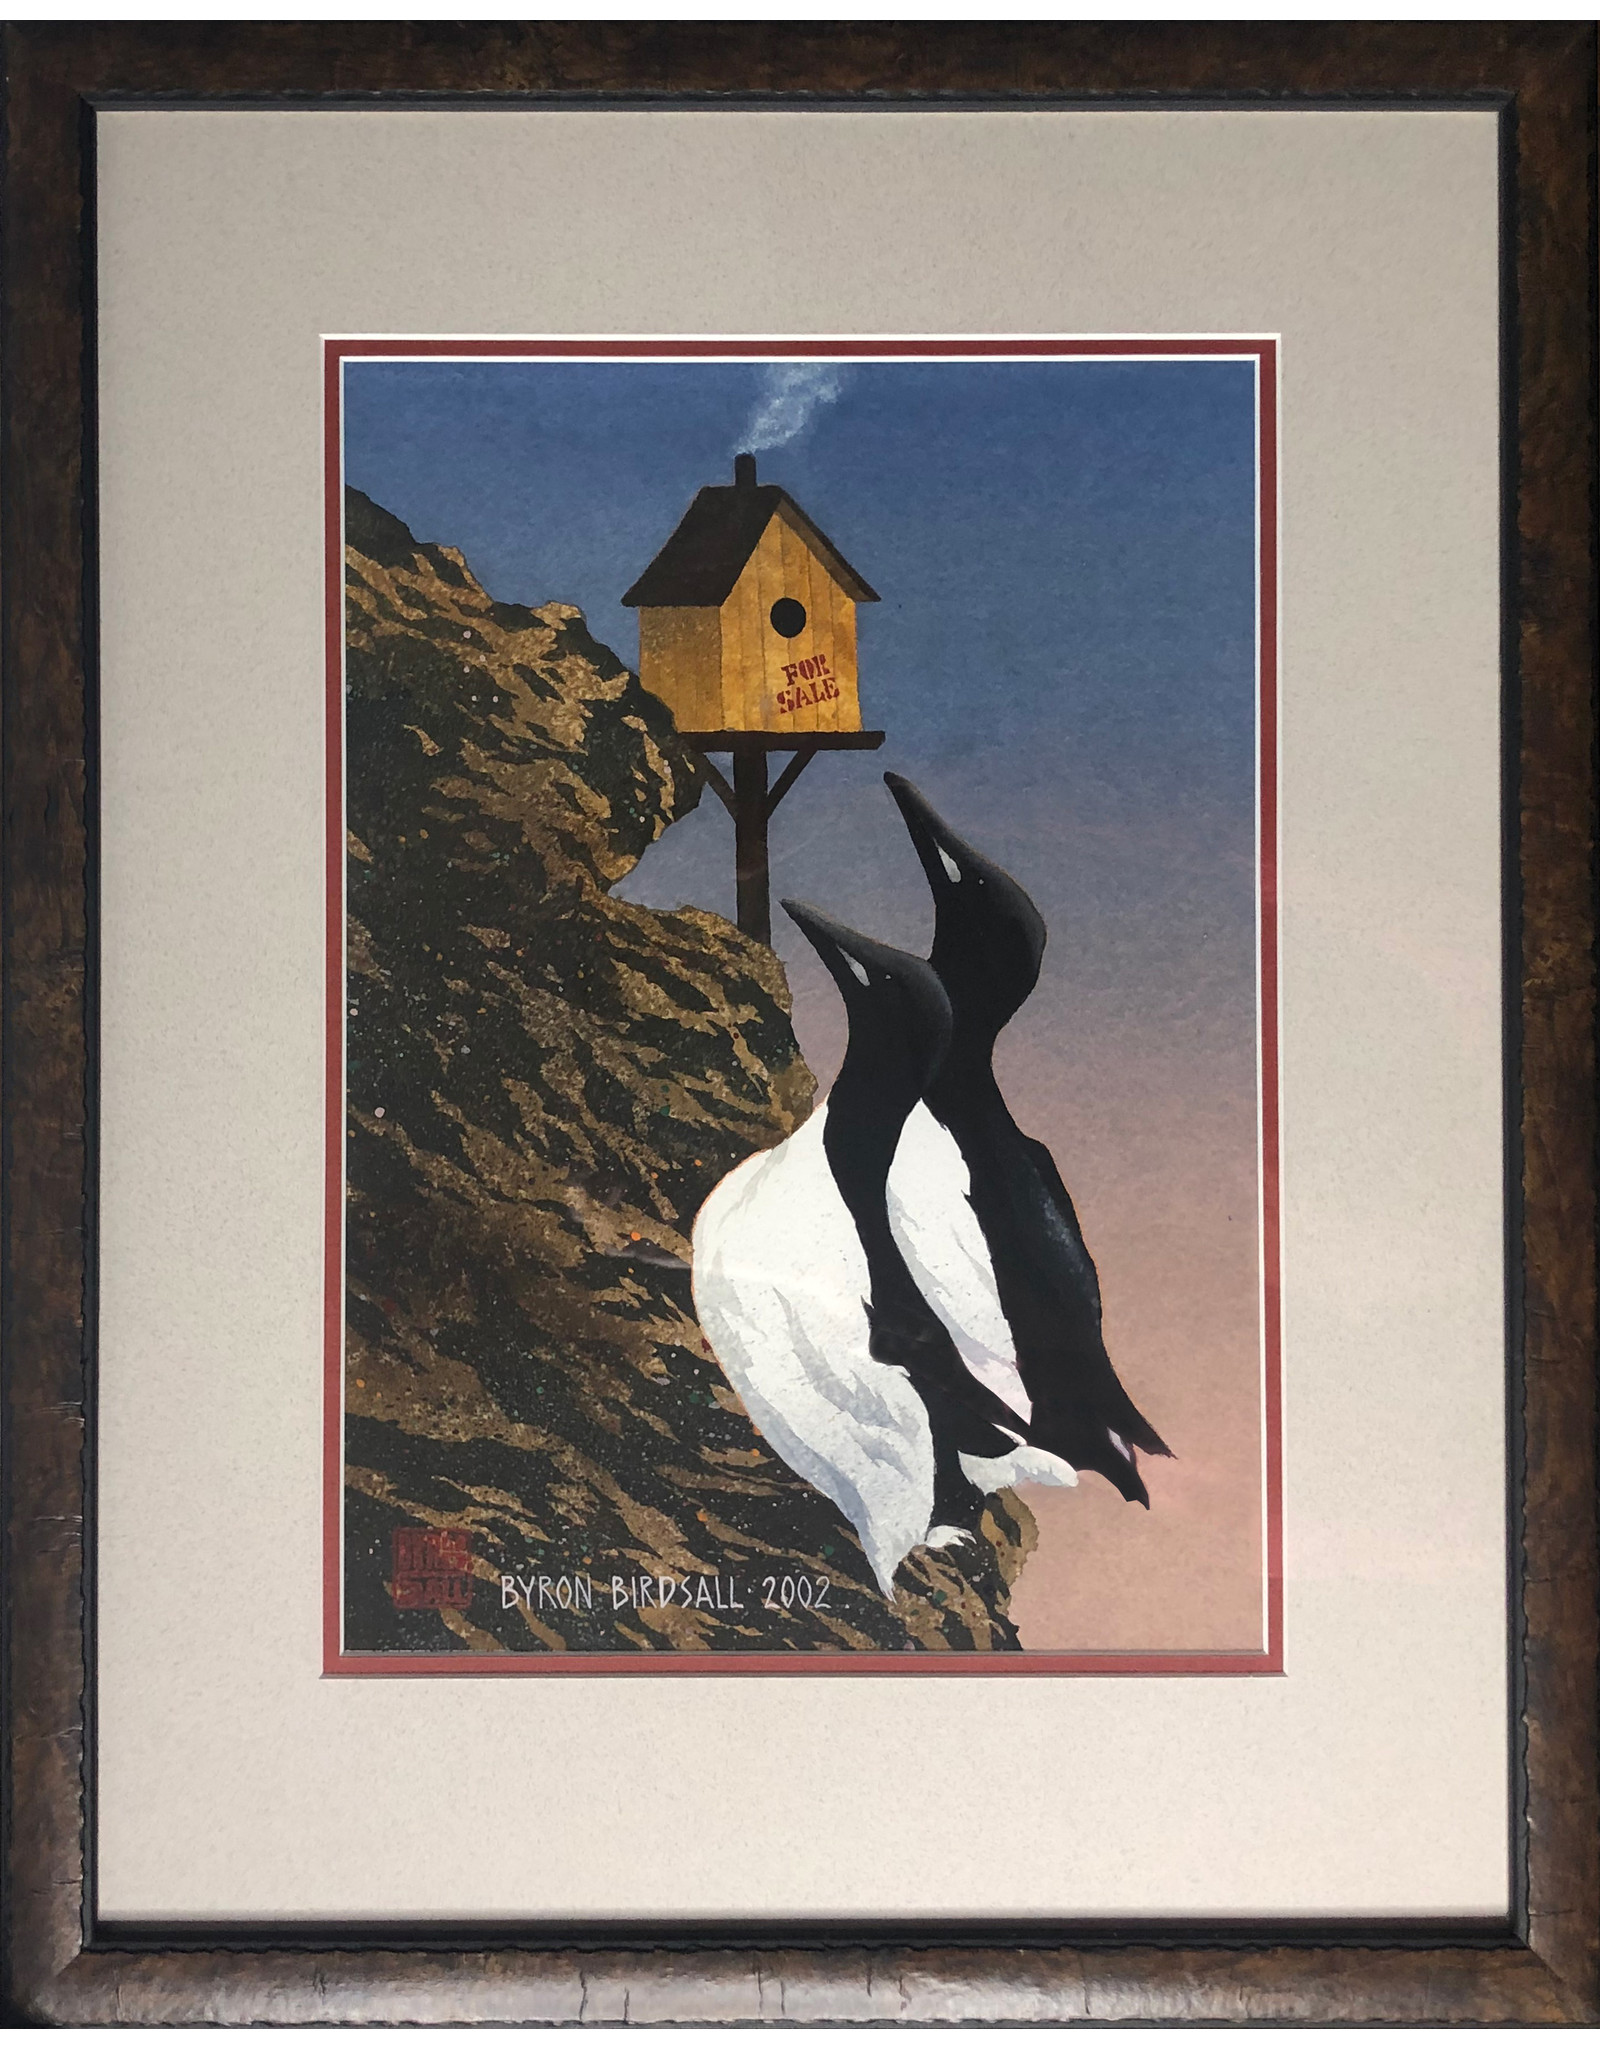 Byron Birdsall Mr. and Mrs. Murre (framed original) | Byron Birdsall